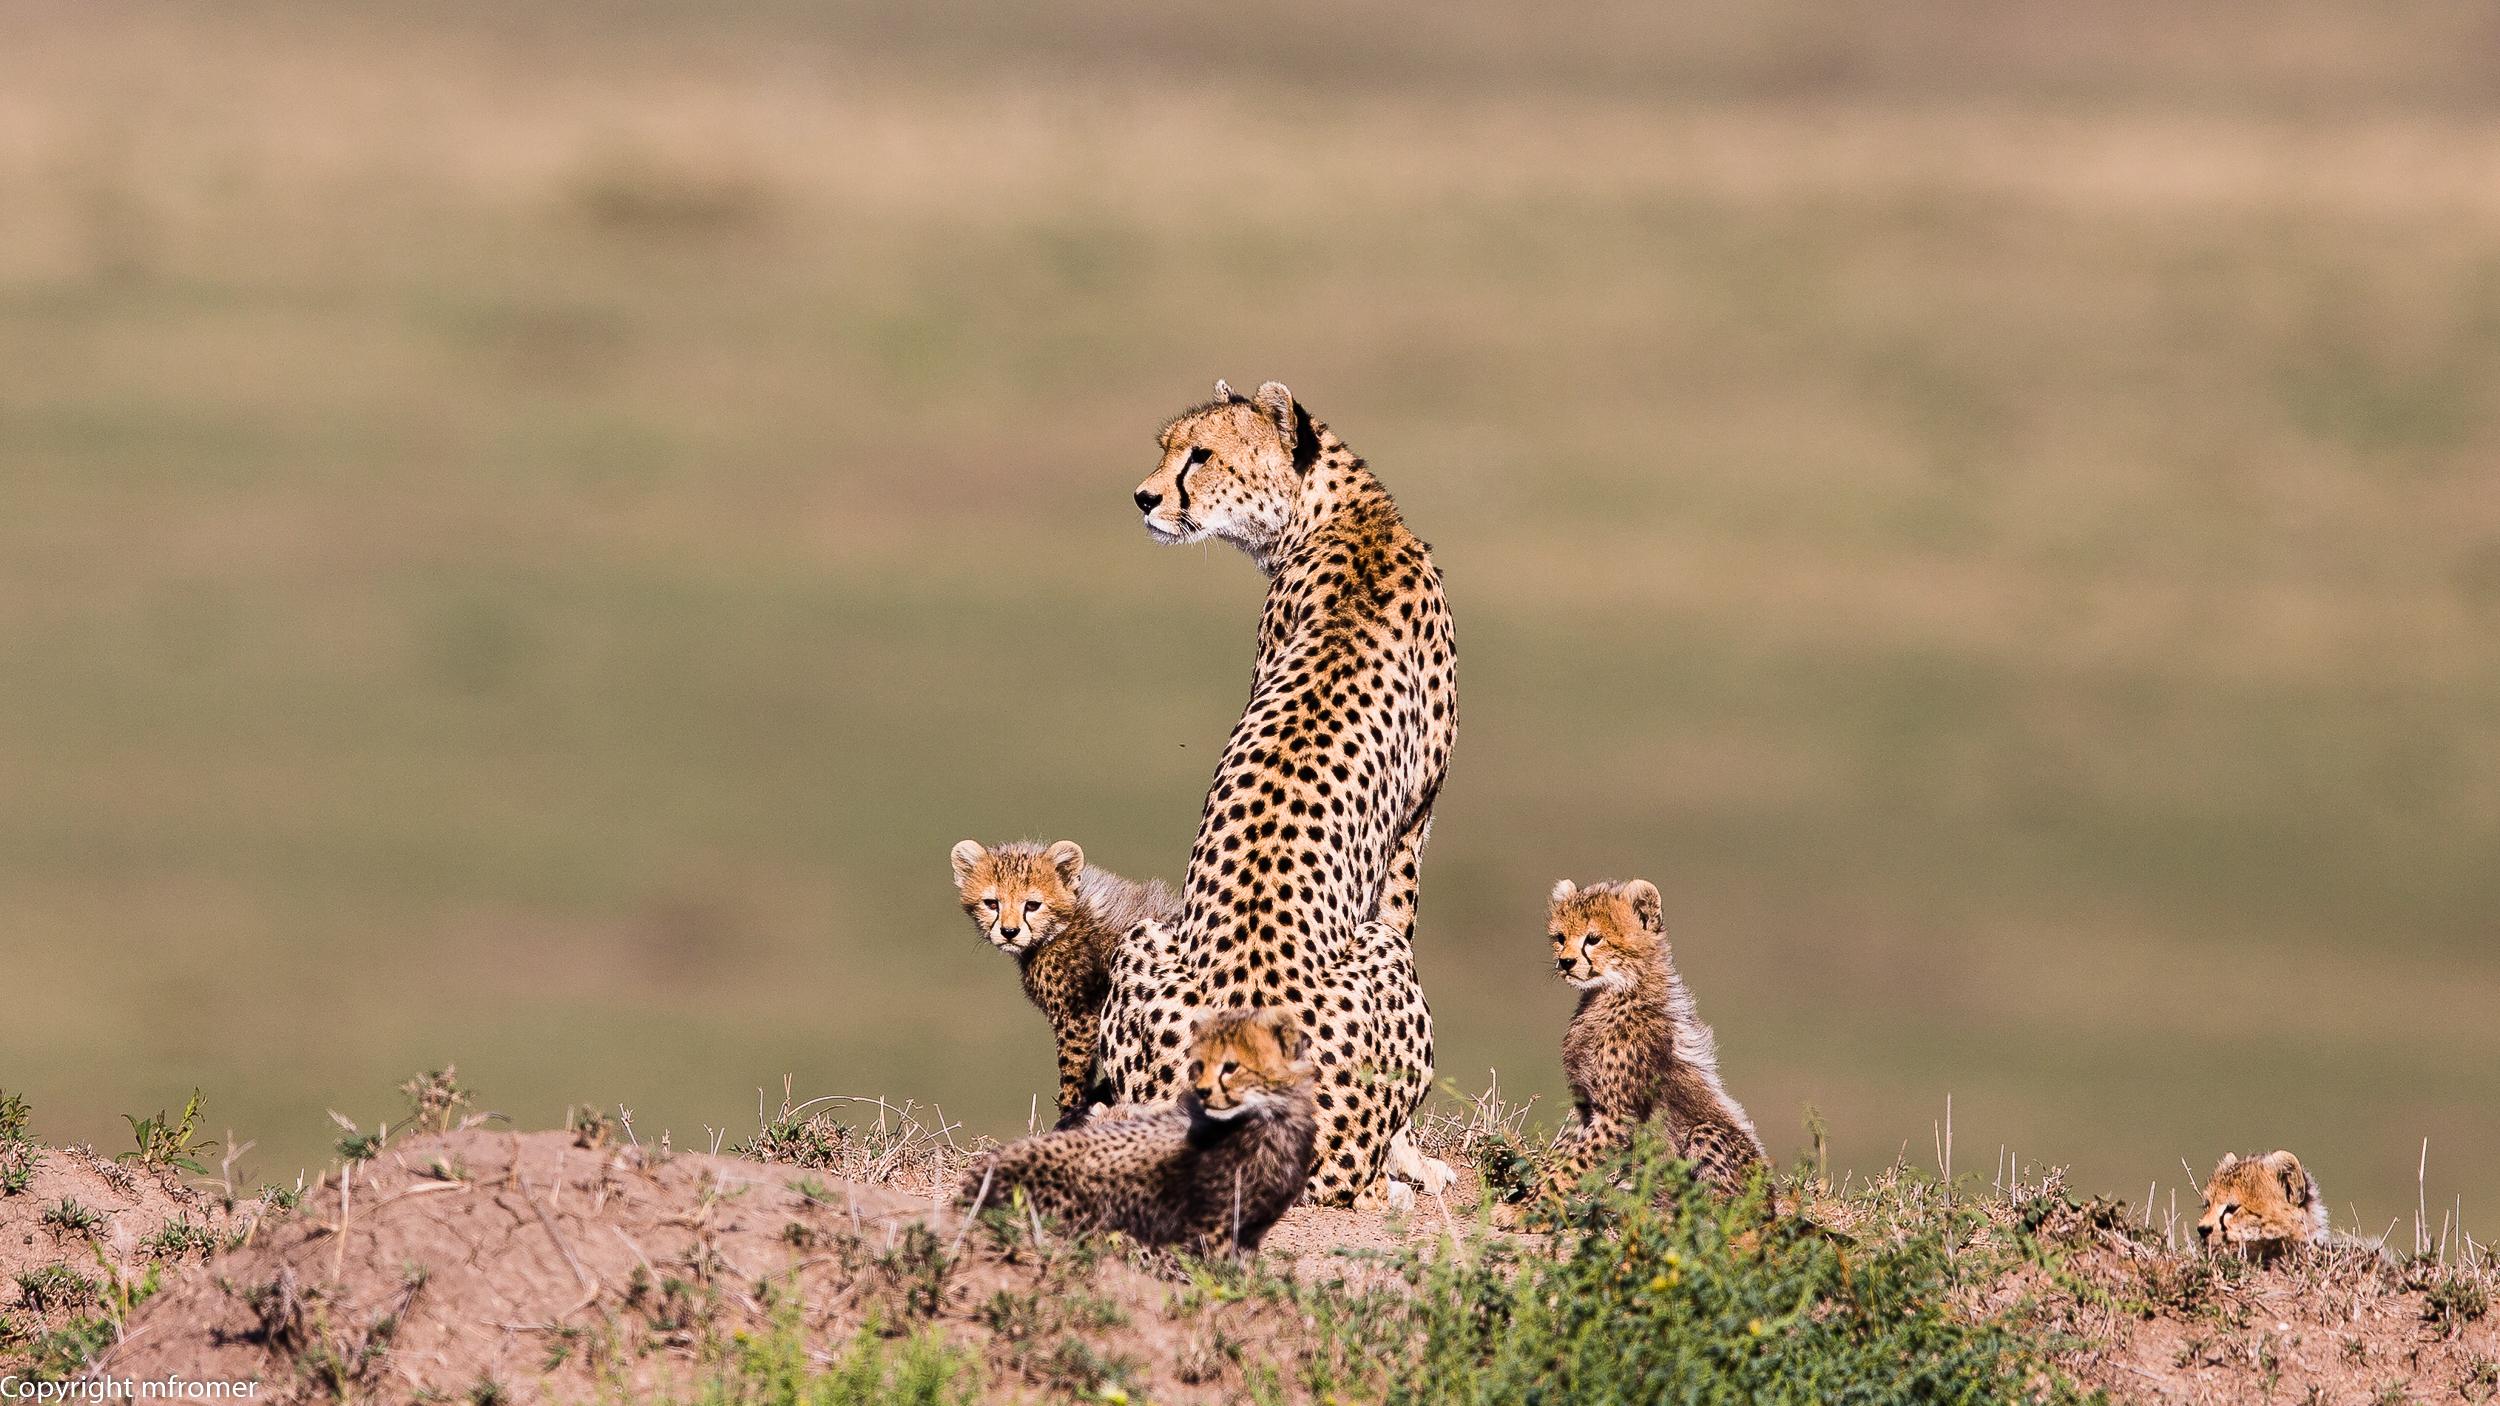 Cheetah Malaika Masai Mara 2014